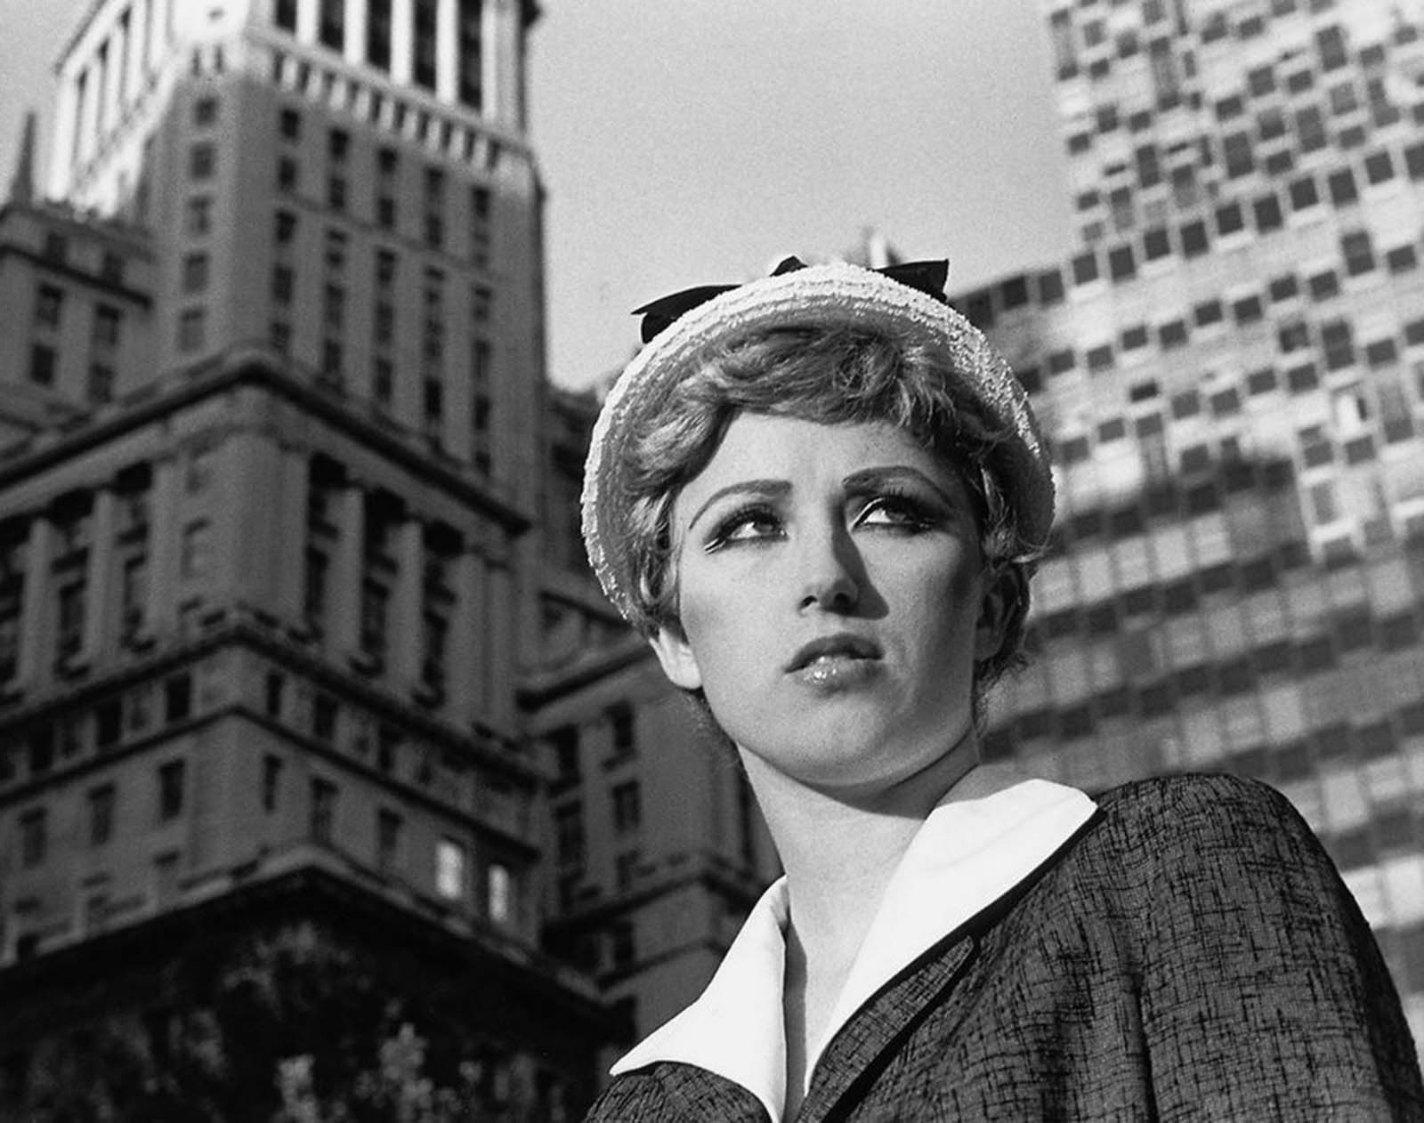 Untitled Film Still #21, Cindy Sherman, 1978